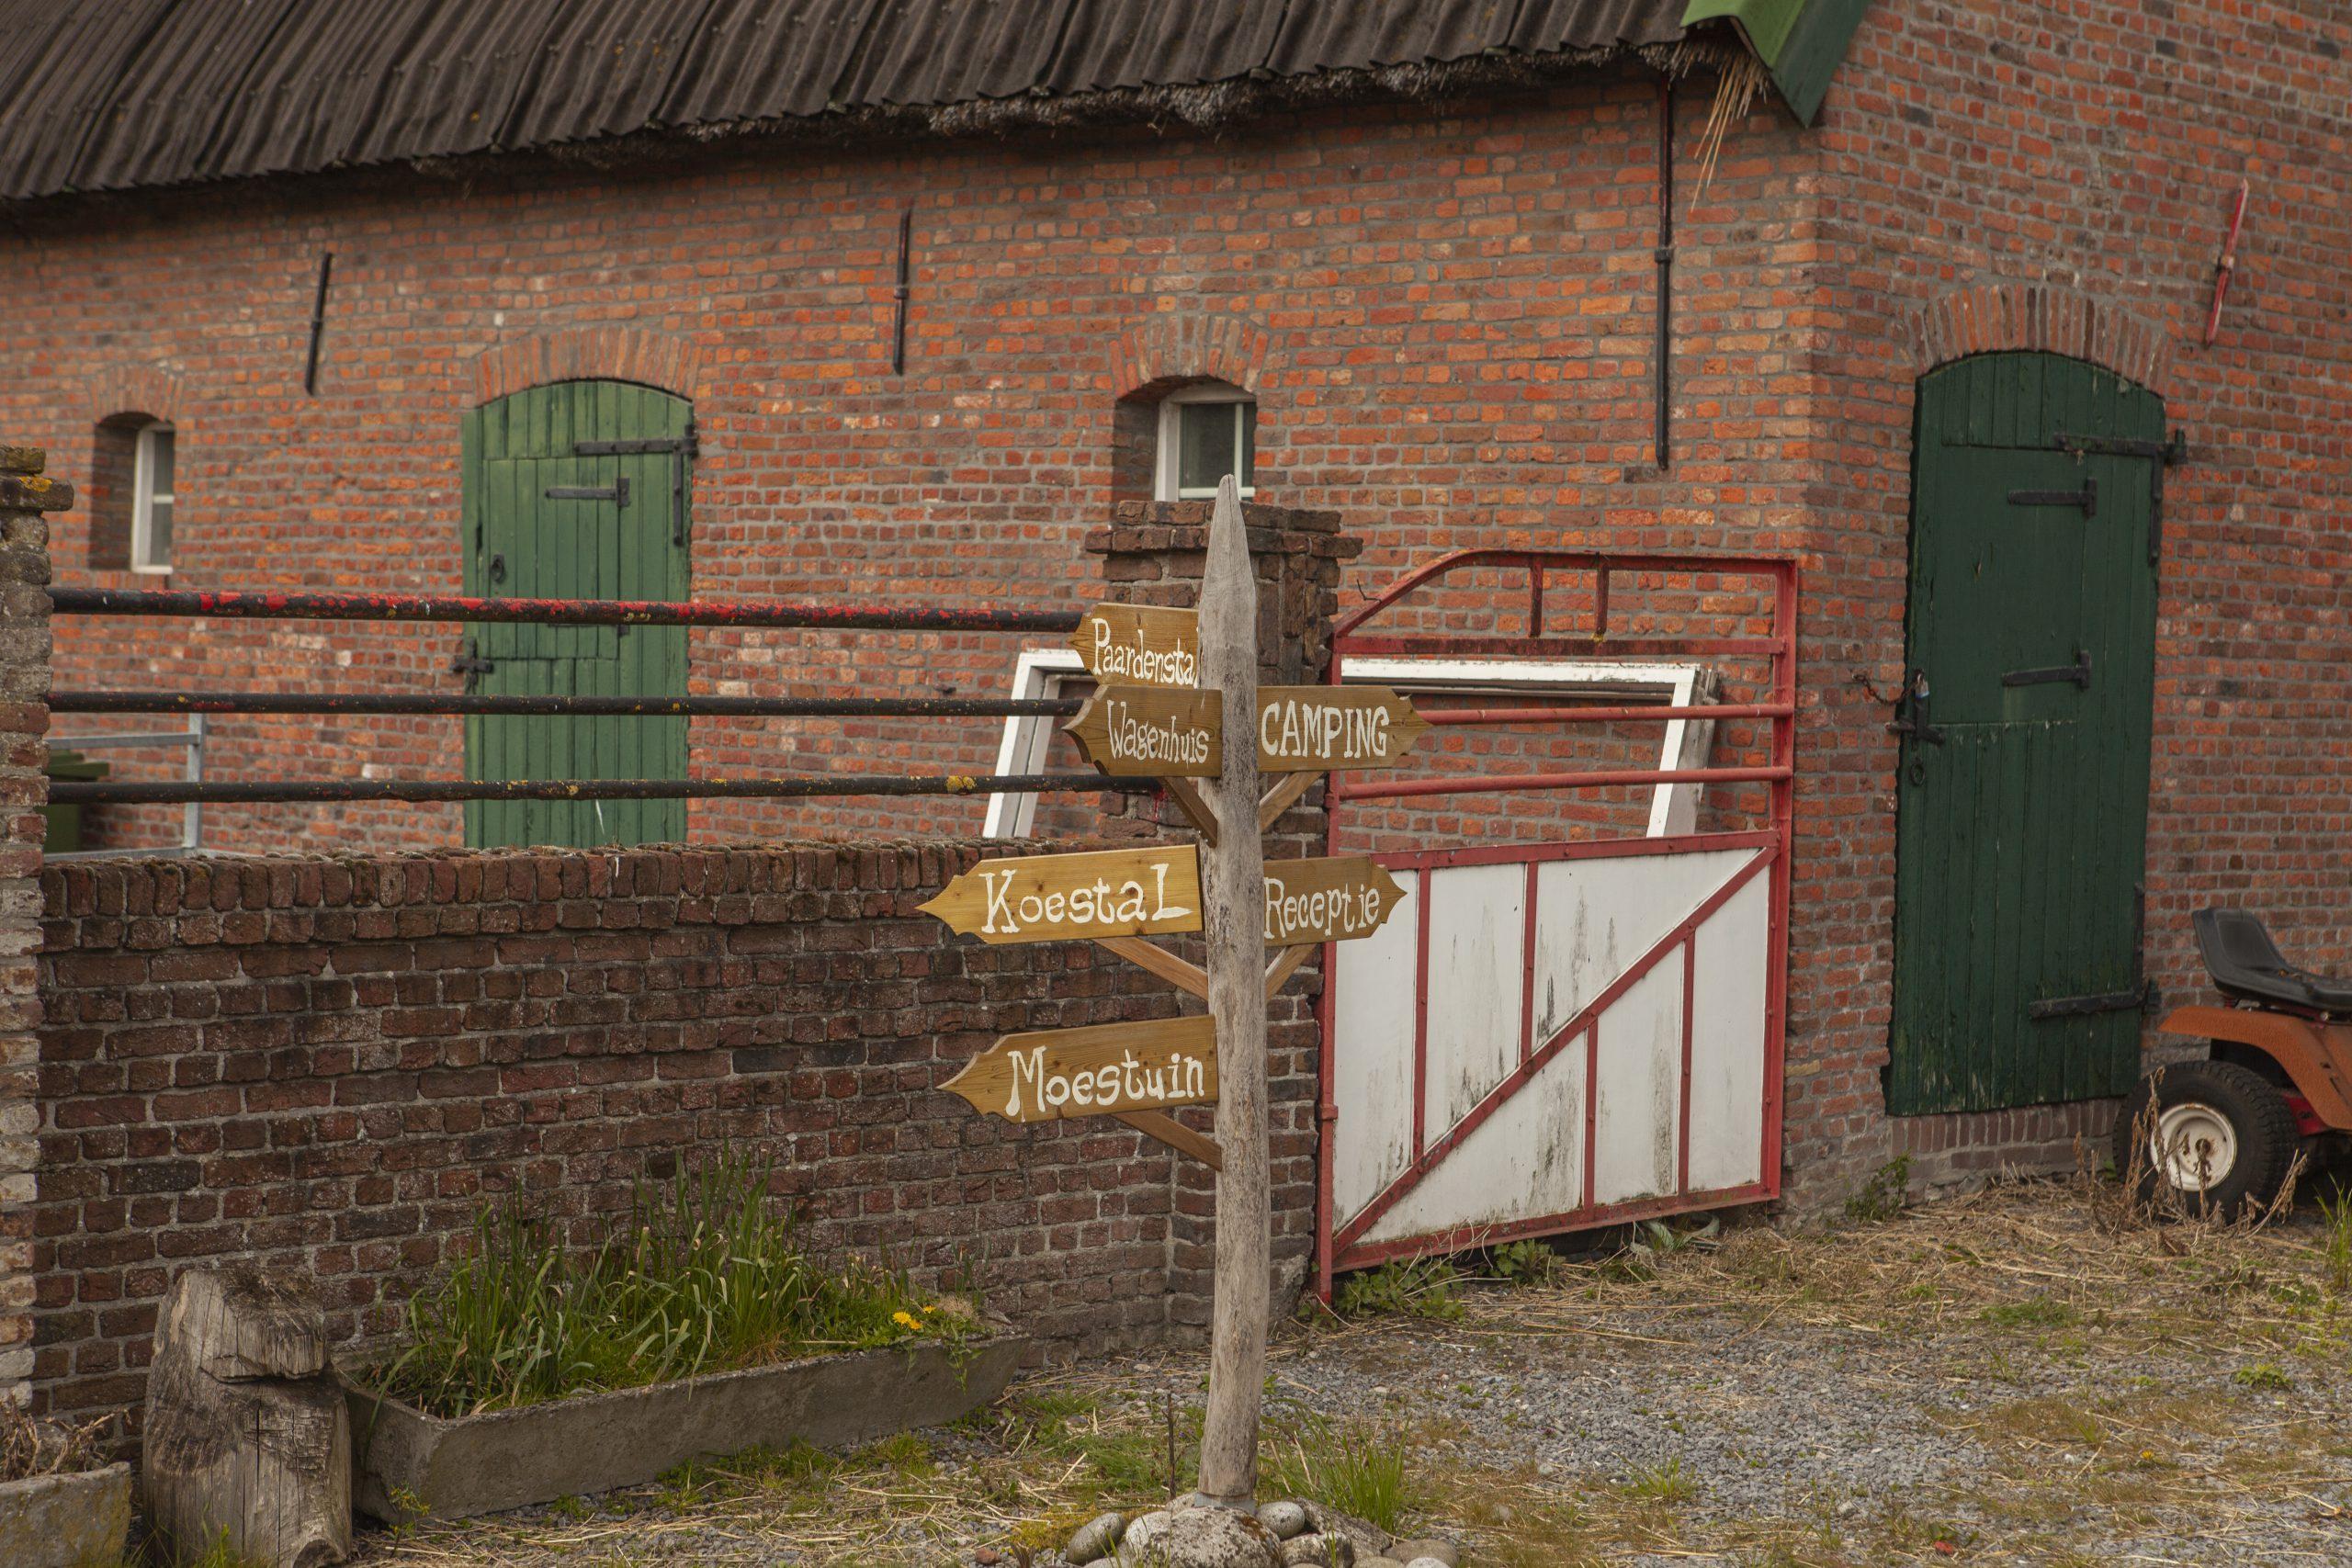 Bord-stal-dagbesteding-informatie-toegang-Hof-Van-Axel-maatschap